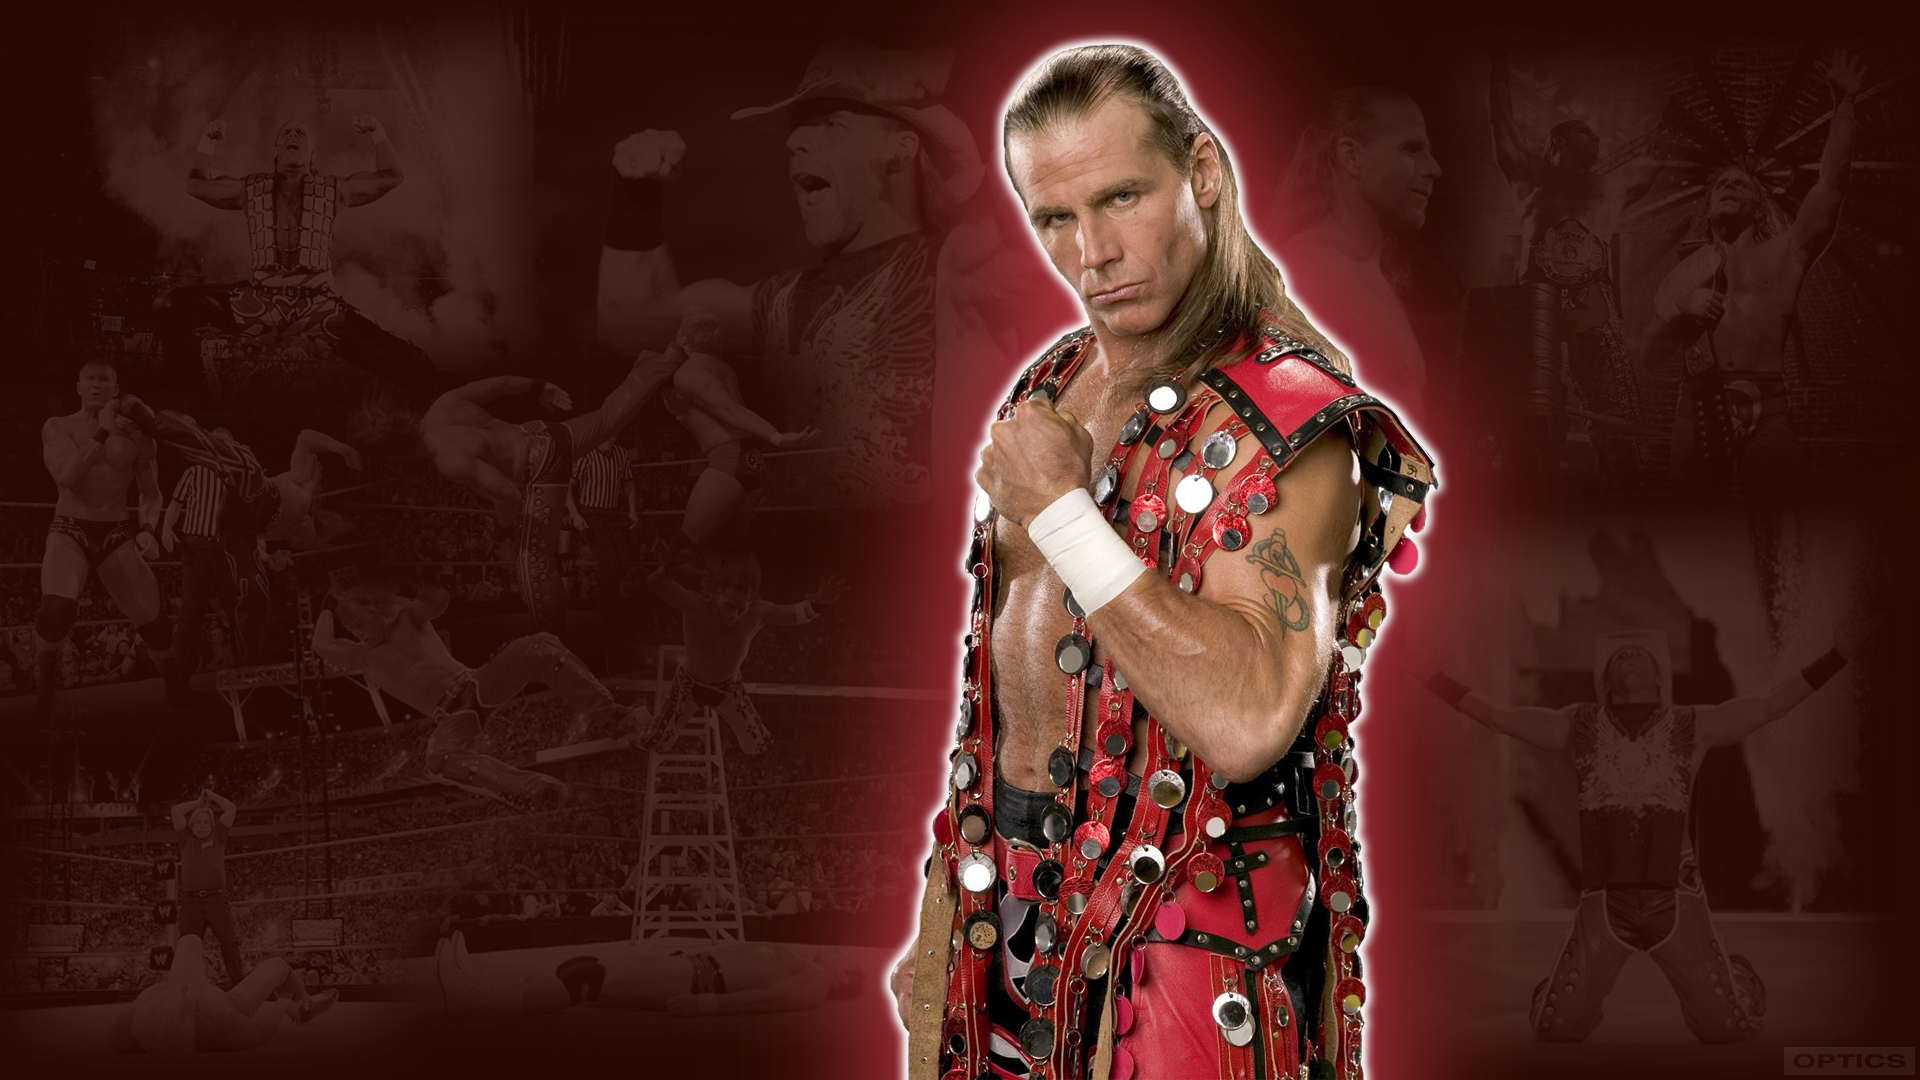 HBK___WWE_Wallpaper_by_0PT1C5